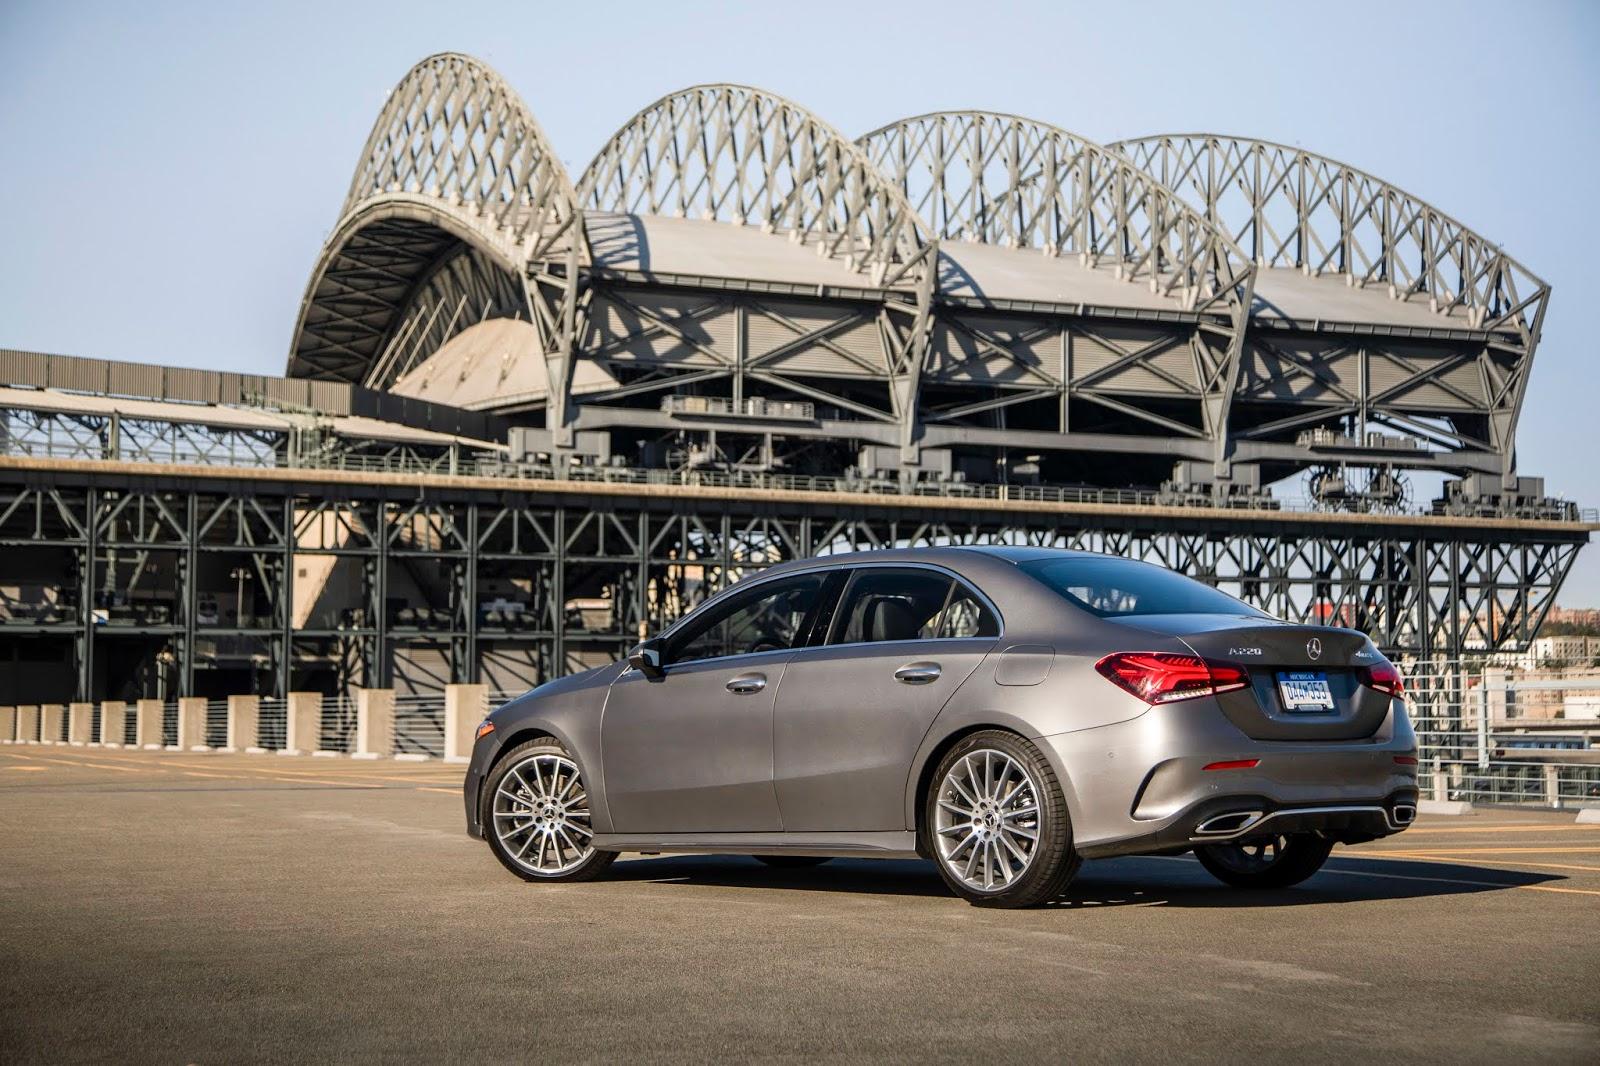 18C0776 008 Από 28.230 ευρώ η τιμή της Mercedes A-Class Sedan Luxury sedan, Mercedes, Mercedes AMG, premium sedan, sedan, zblog, καινούργιο, καινούρια, τιμες